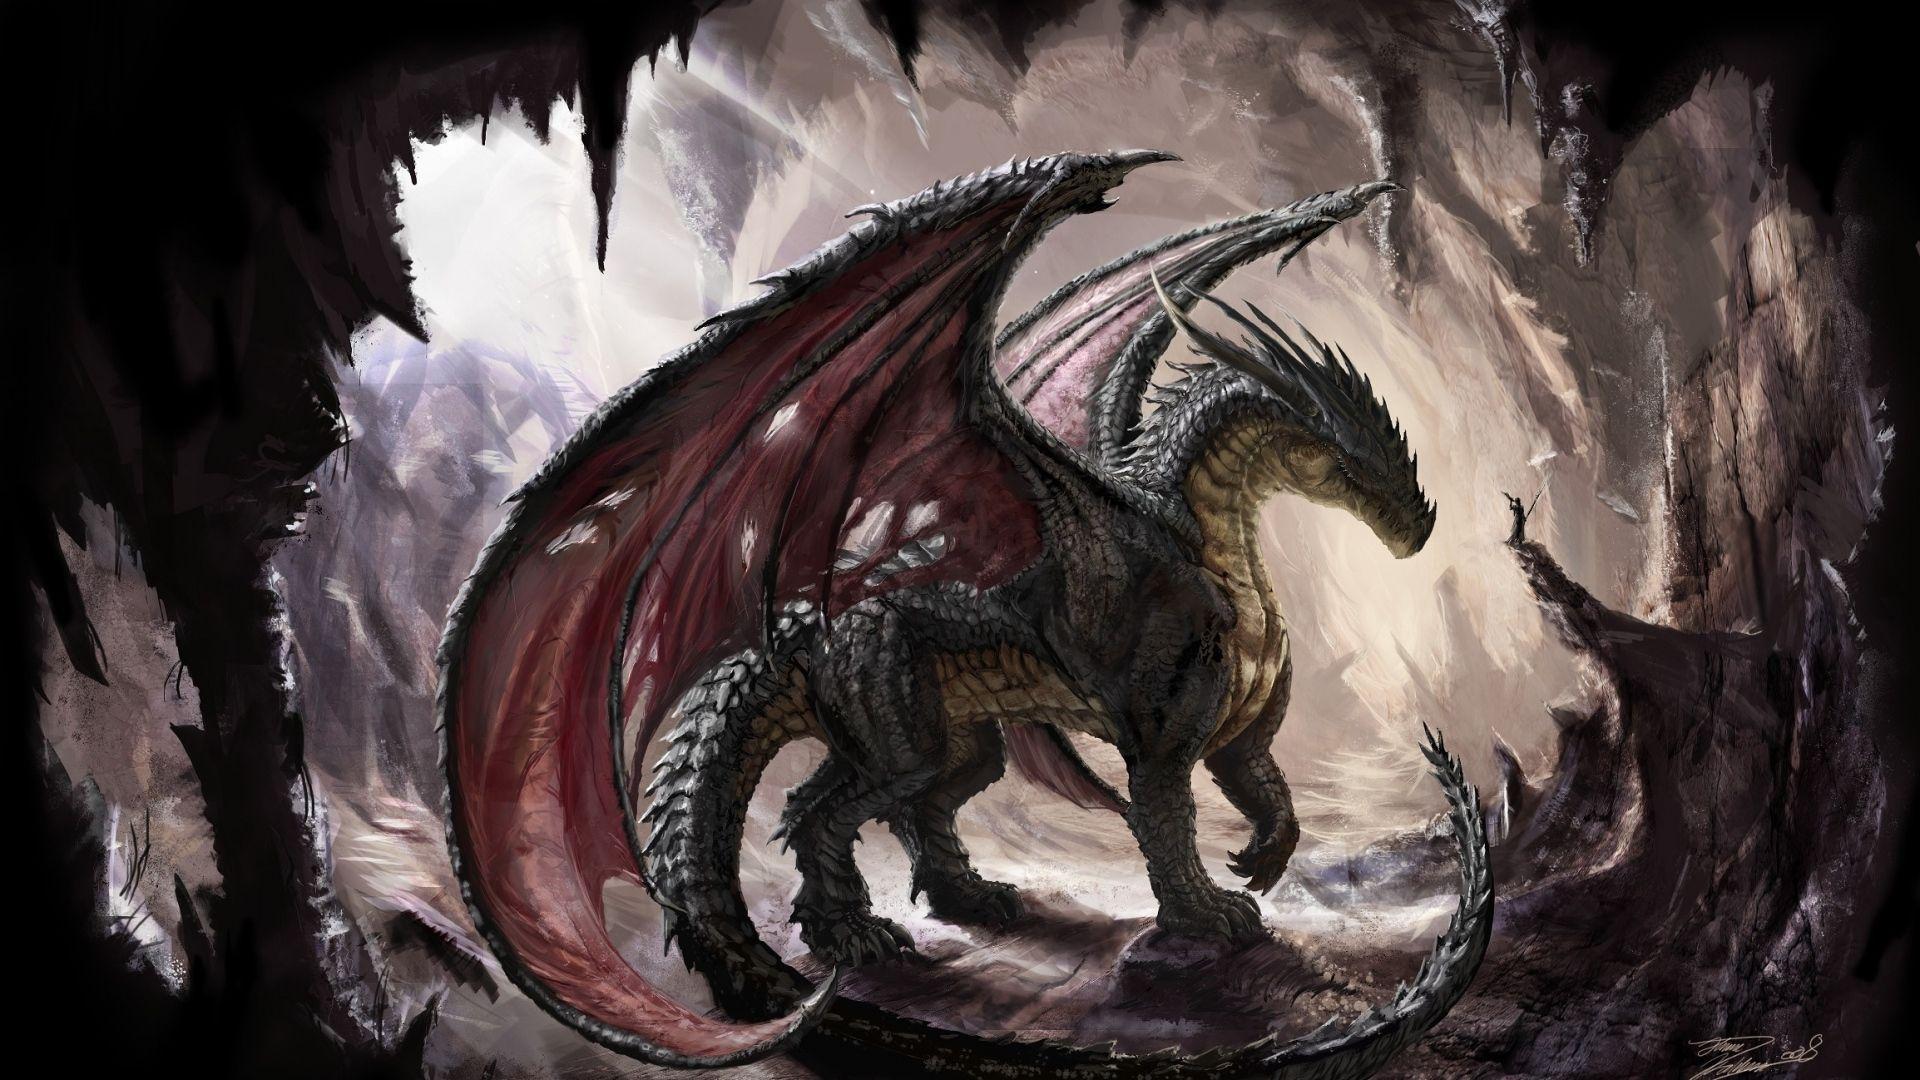 10 Latest Dragon Wallpaper Hd 1080p Full Hd 1920 1080 For Pc Background Dragon Pictures Dragon Cave Fantasy Dragon